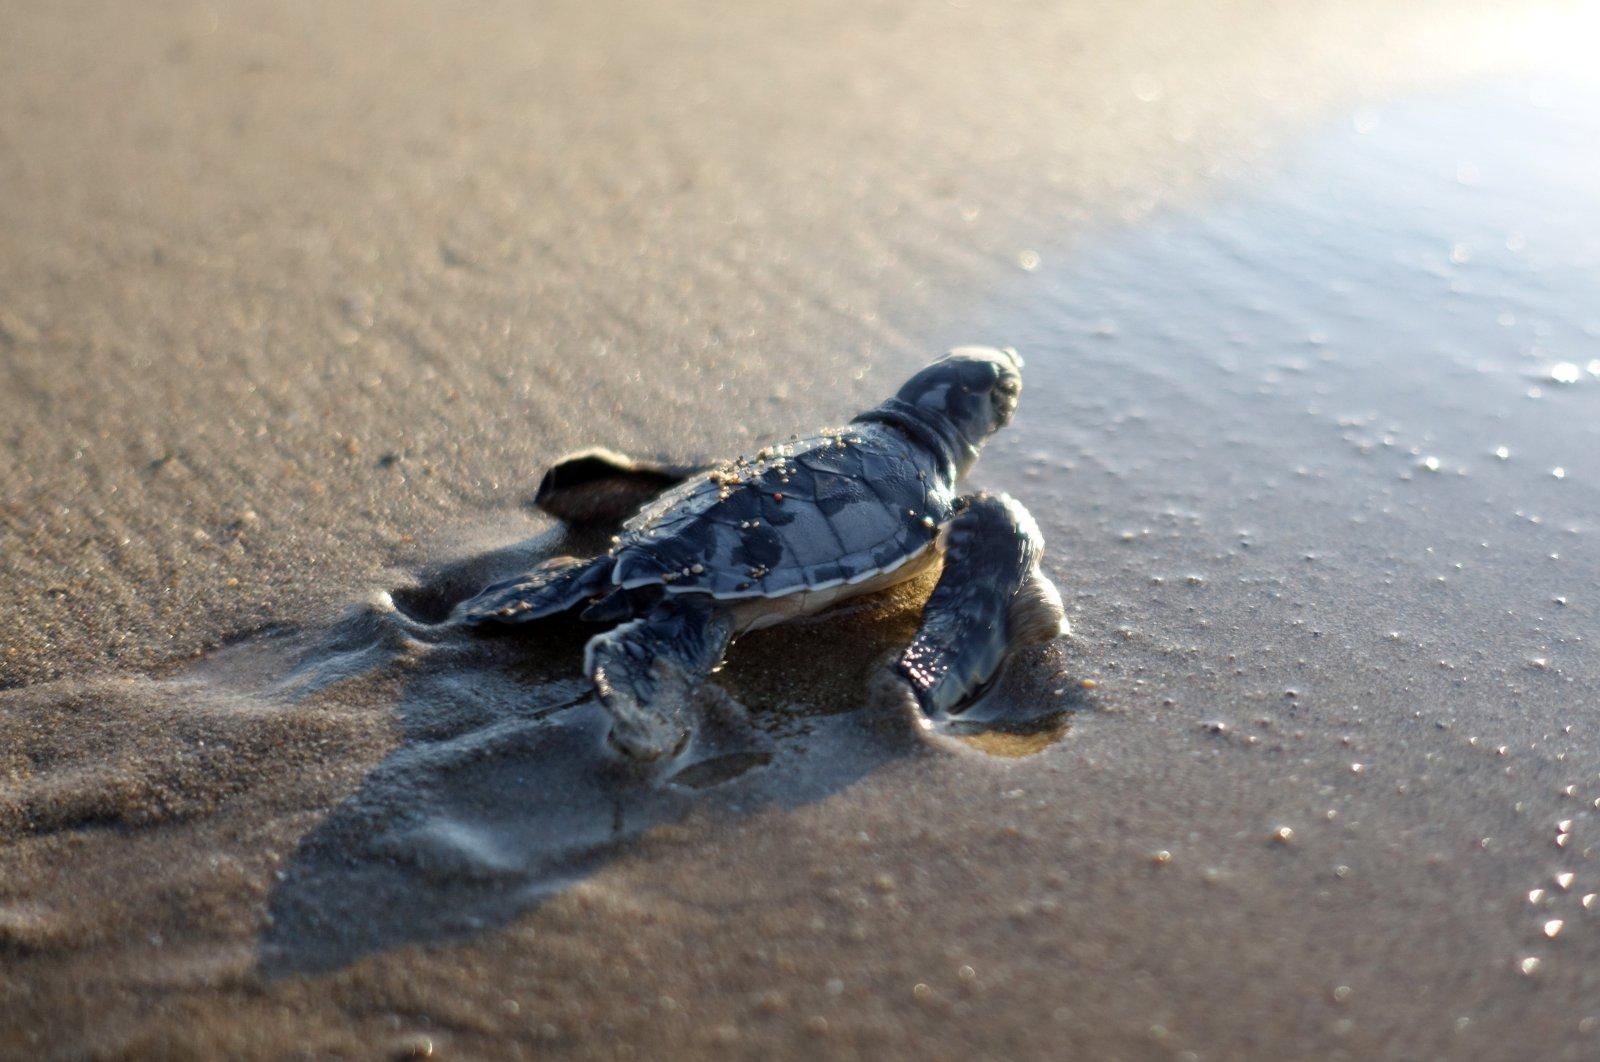 A loggerhead sea turtle is seen crawling toward the Mediterranean Sea at a beach in Antalya, southern Turkey on Nov. 19, 2020. (DHA Photo)